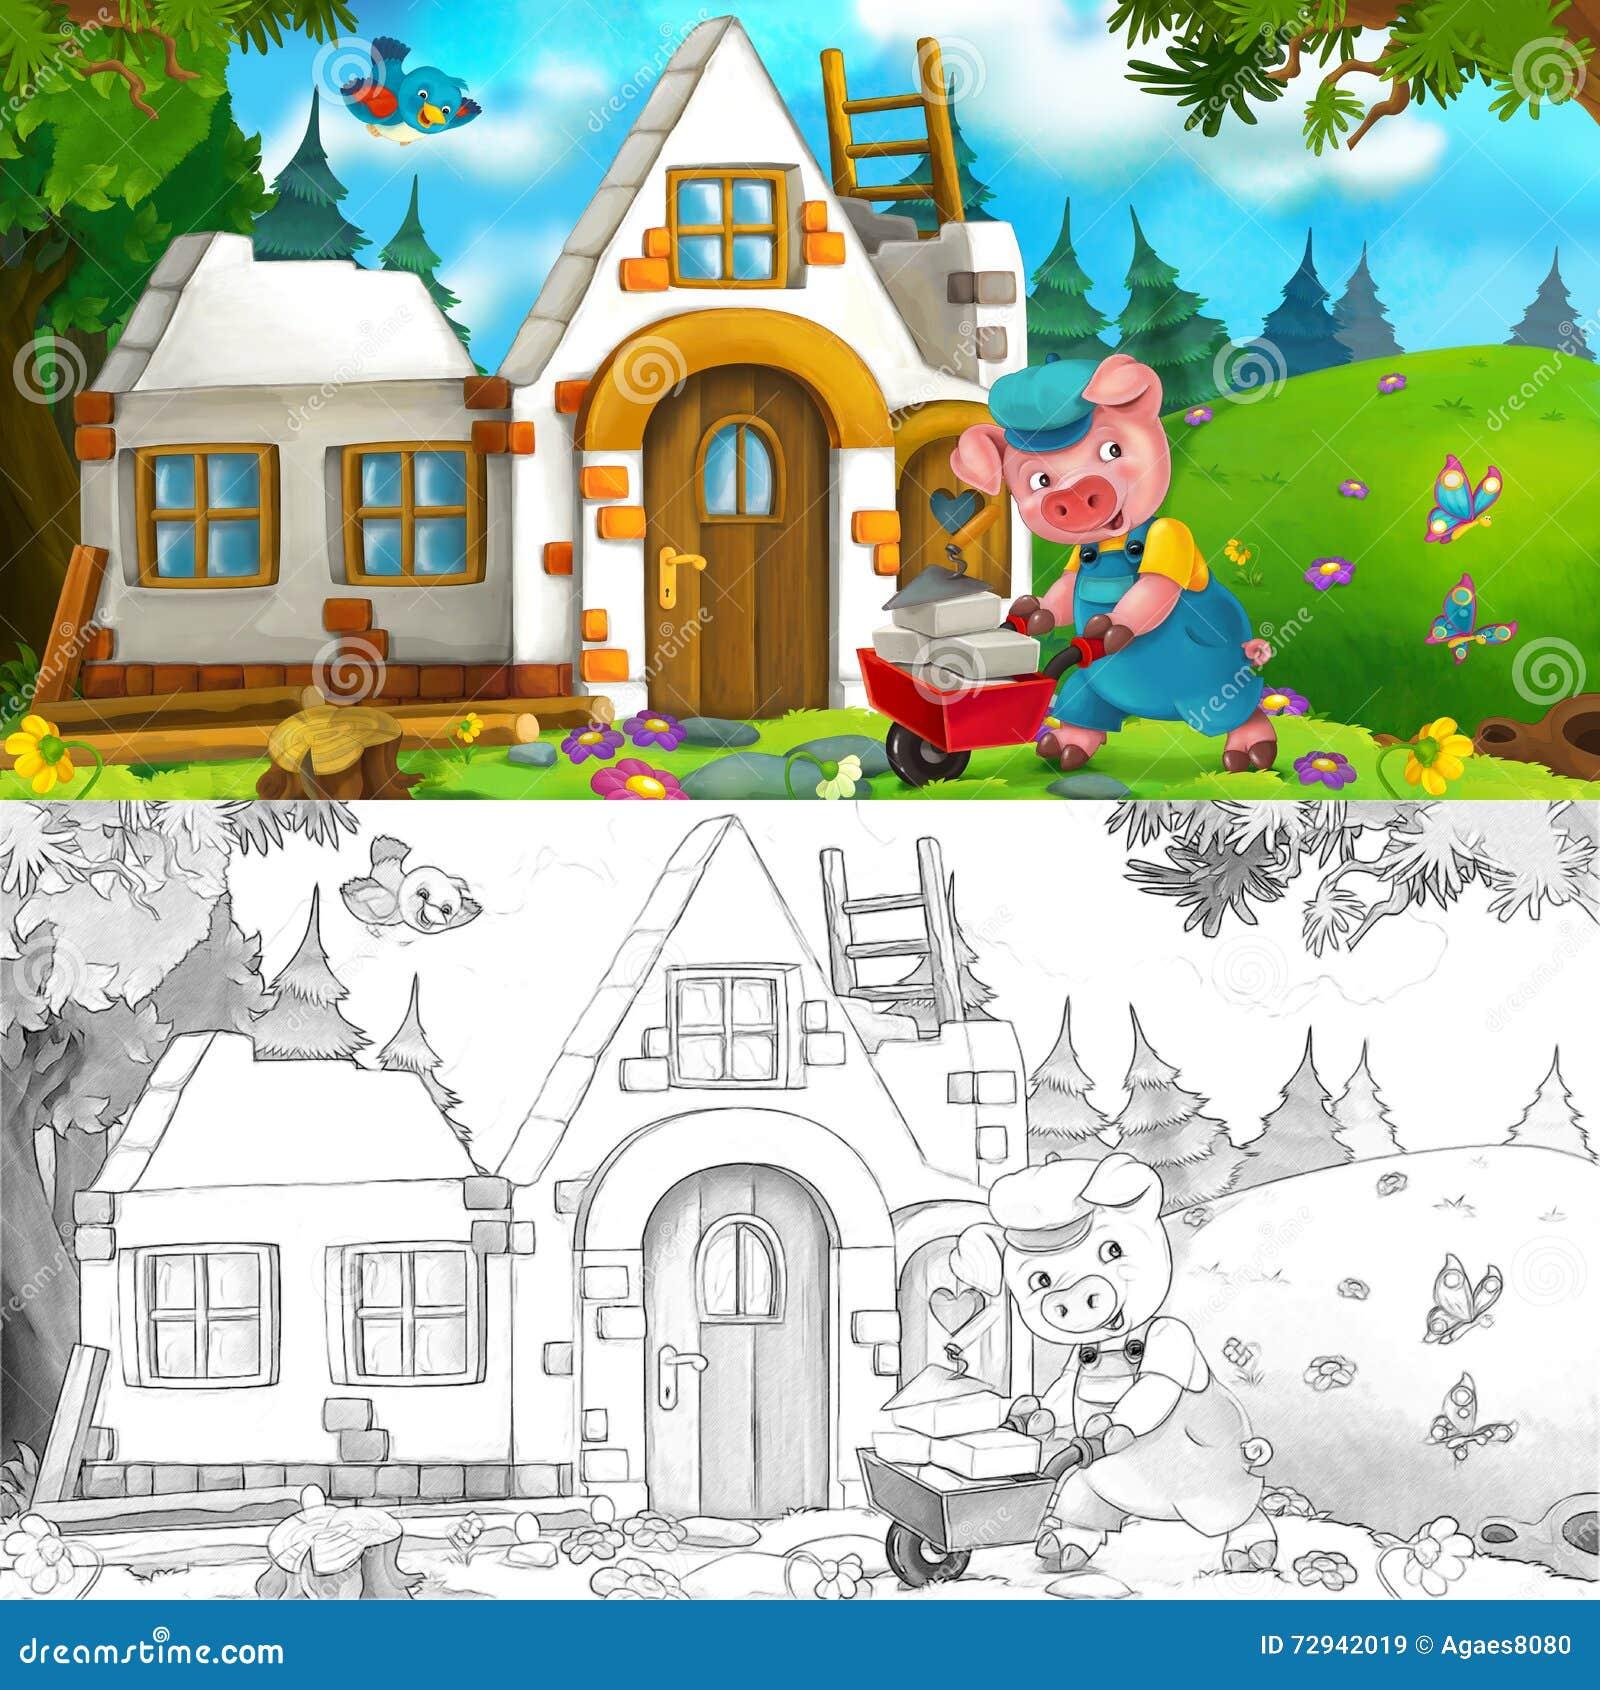 Download Cartoon Scene Of Hard Working Pig